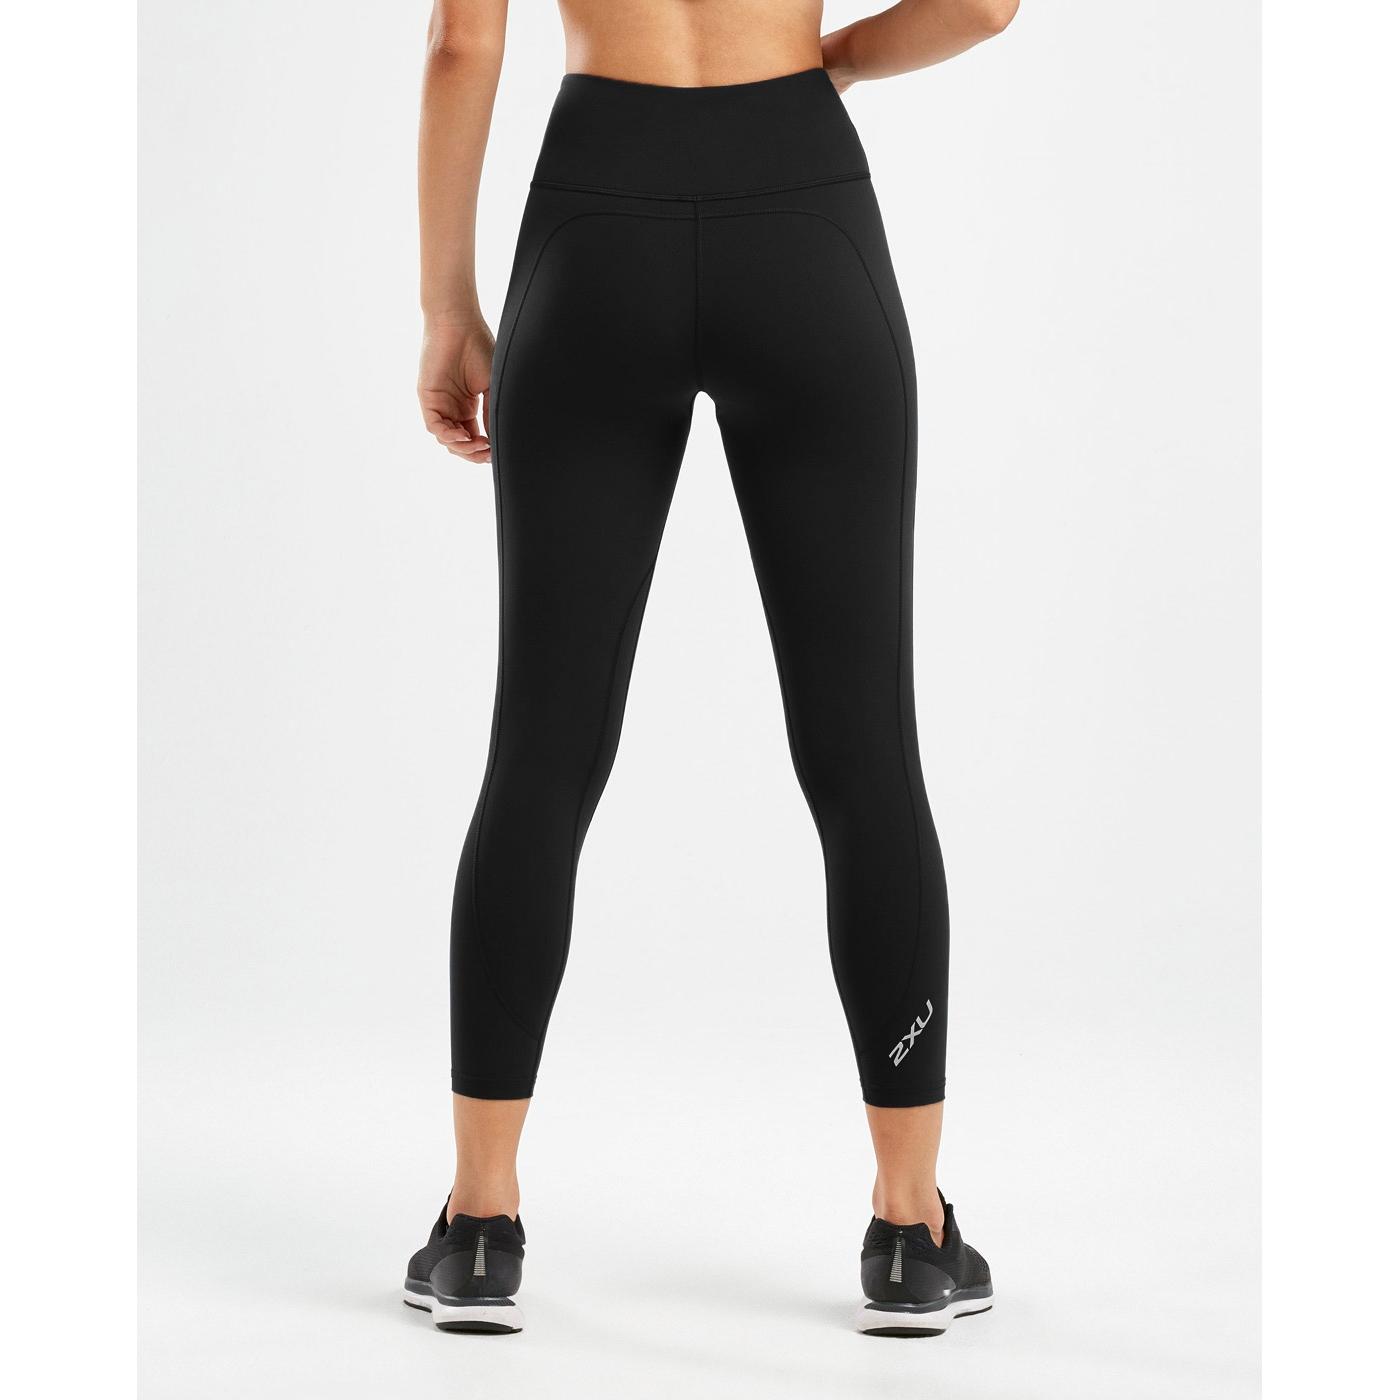 Imagen de 2XU Fitness Hi-Rise Compression Mallas de 7/8 para mujer - Tall - black/black